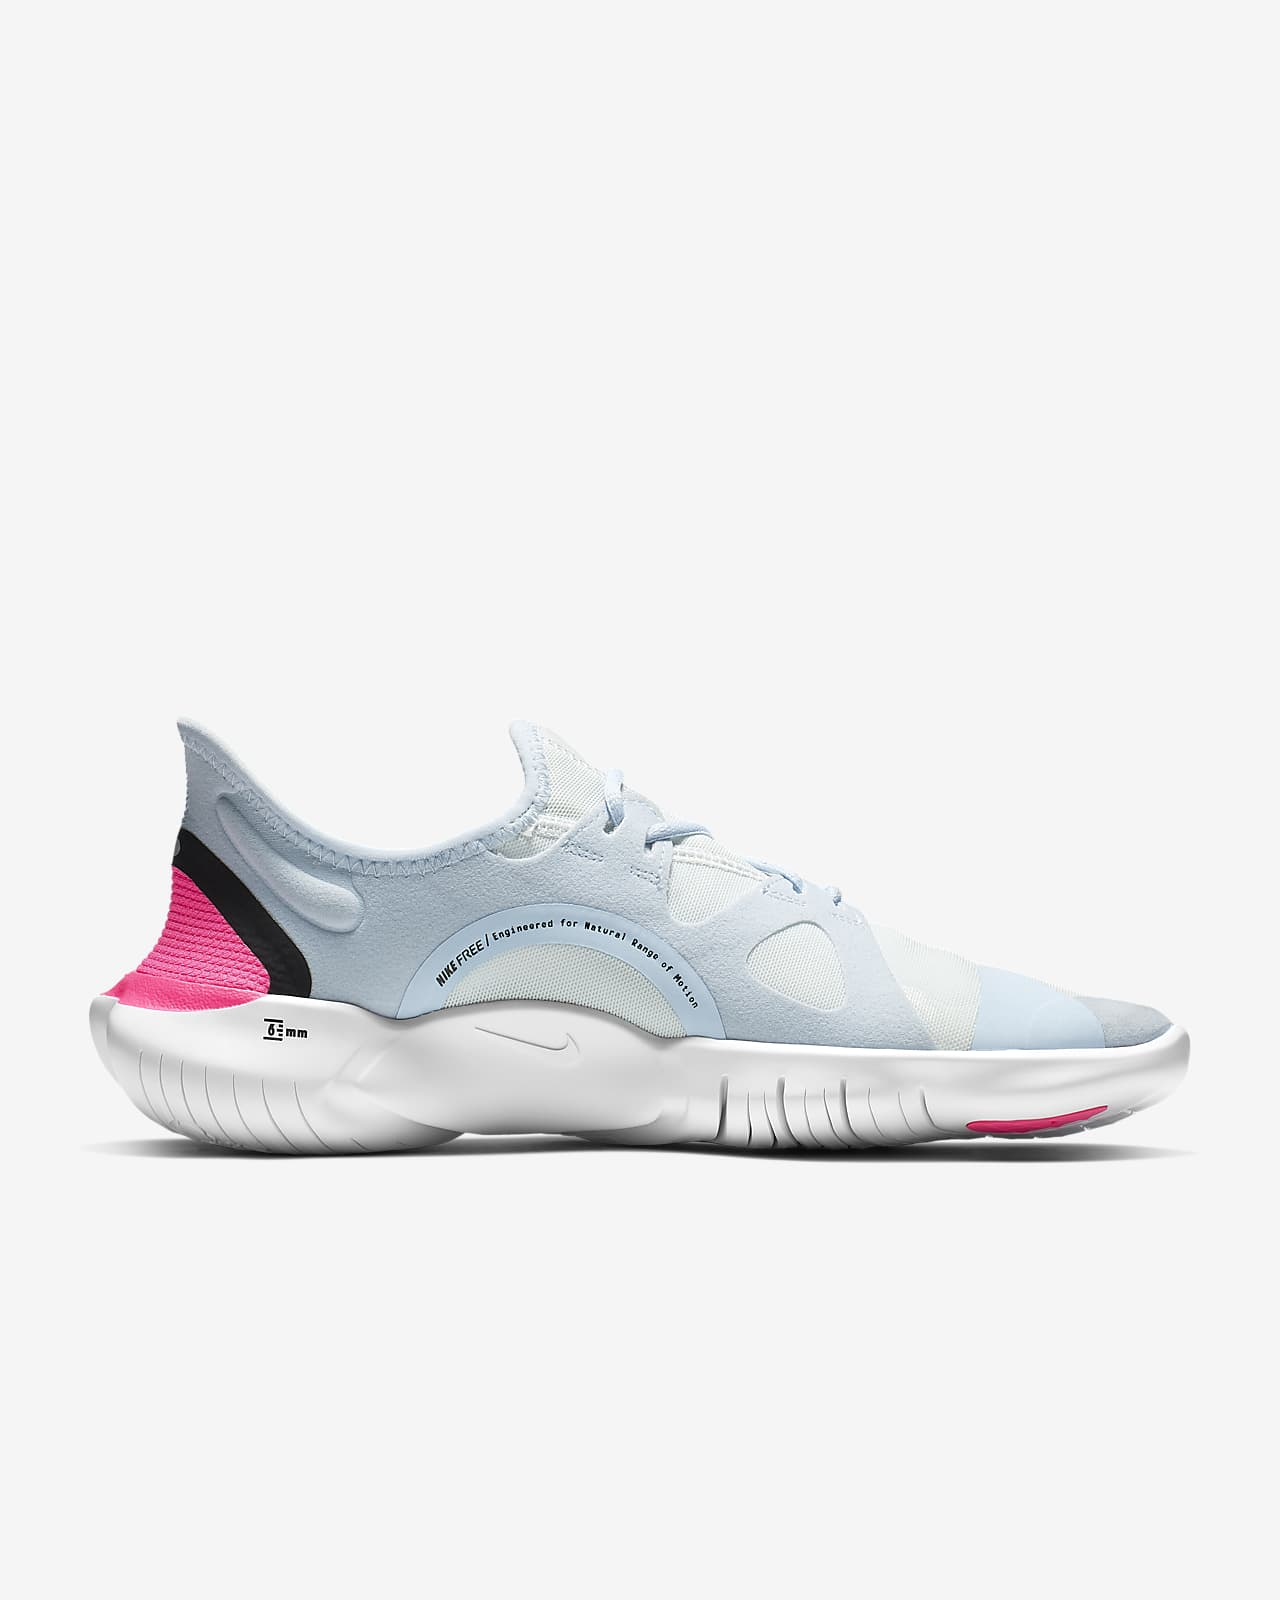 Consejo teatro hogar  Nike Free RN 5.0 Women's Running Shoe. Nike.com